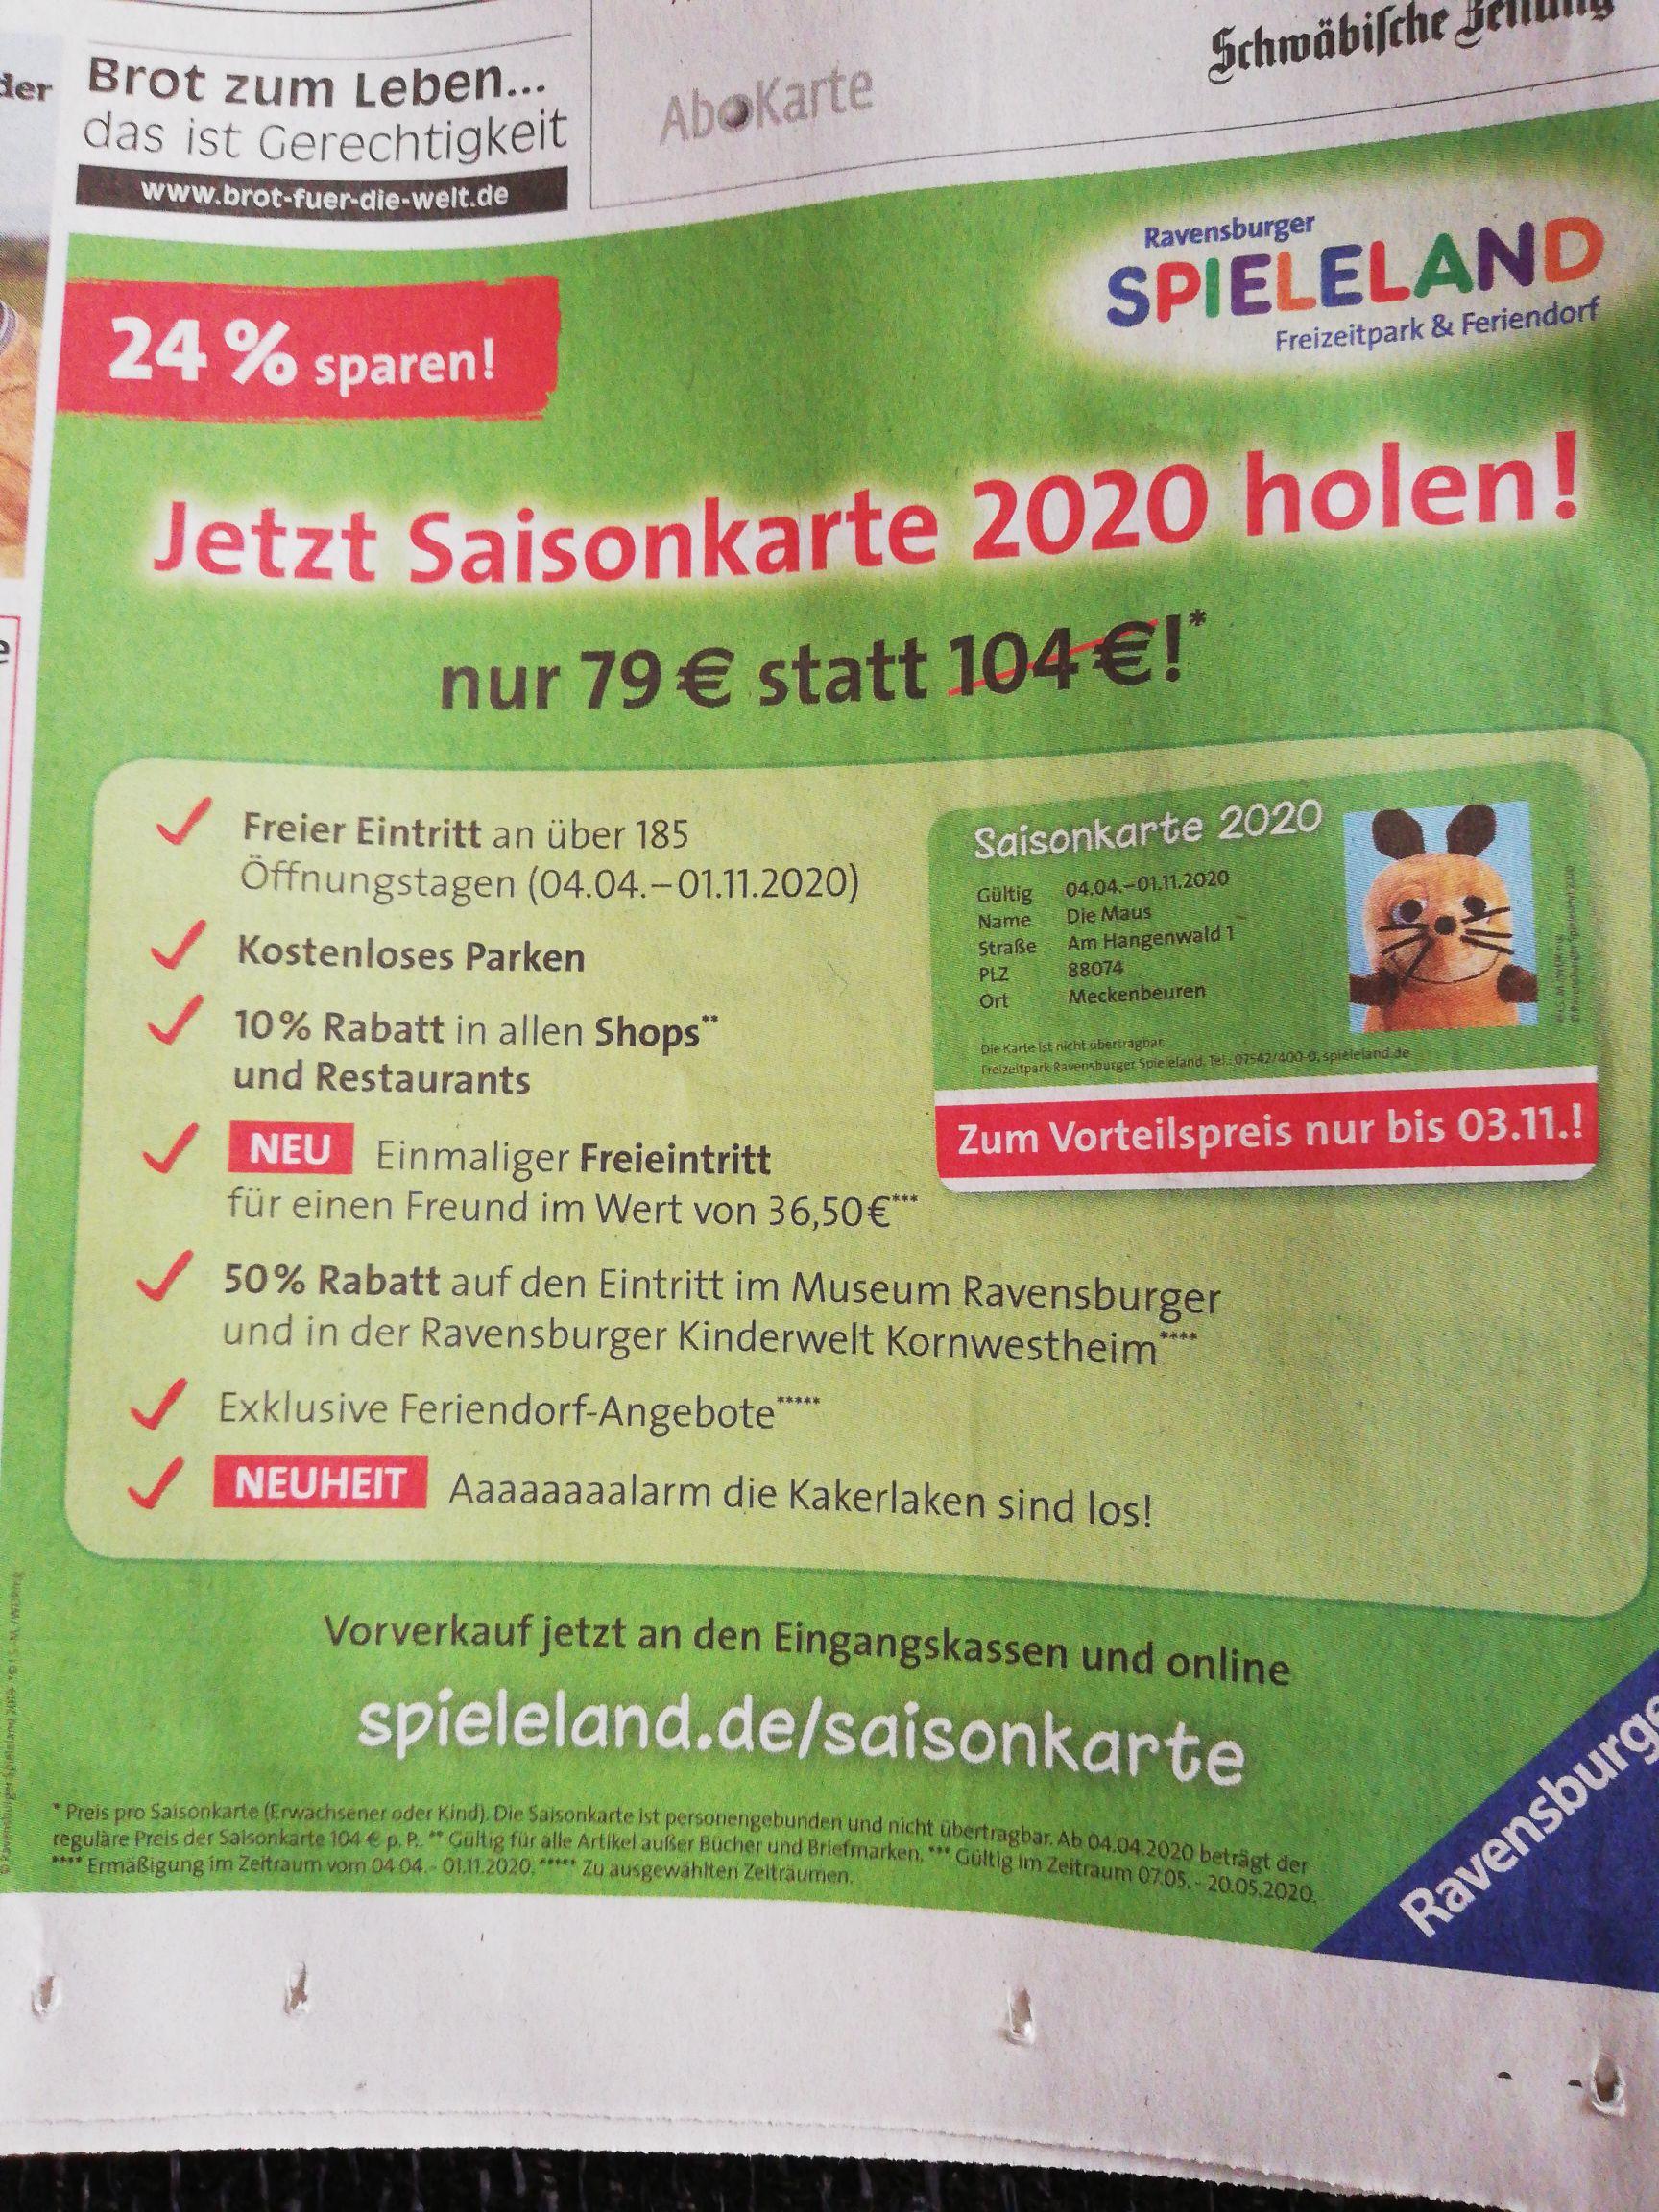 Ravensburger Spieleland Saisonkarte 2020